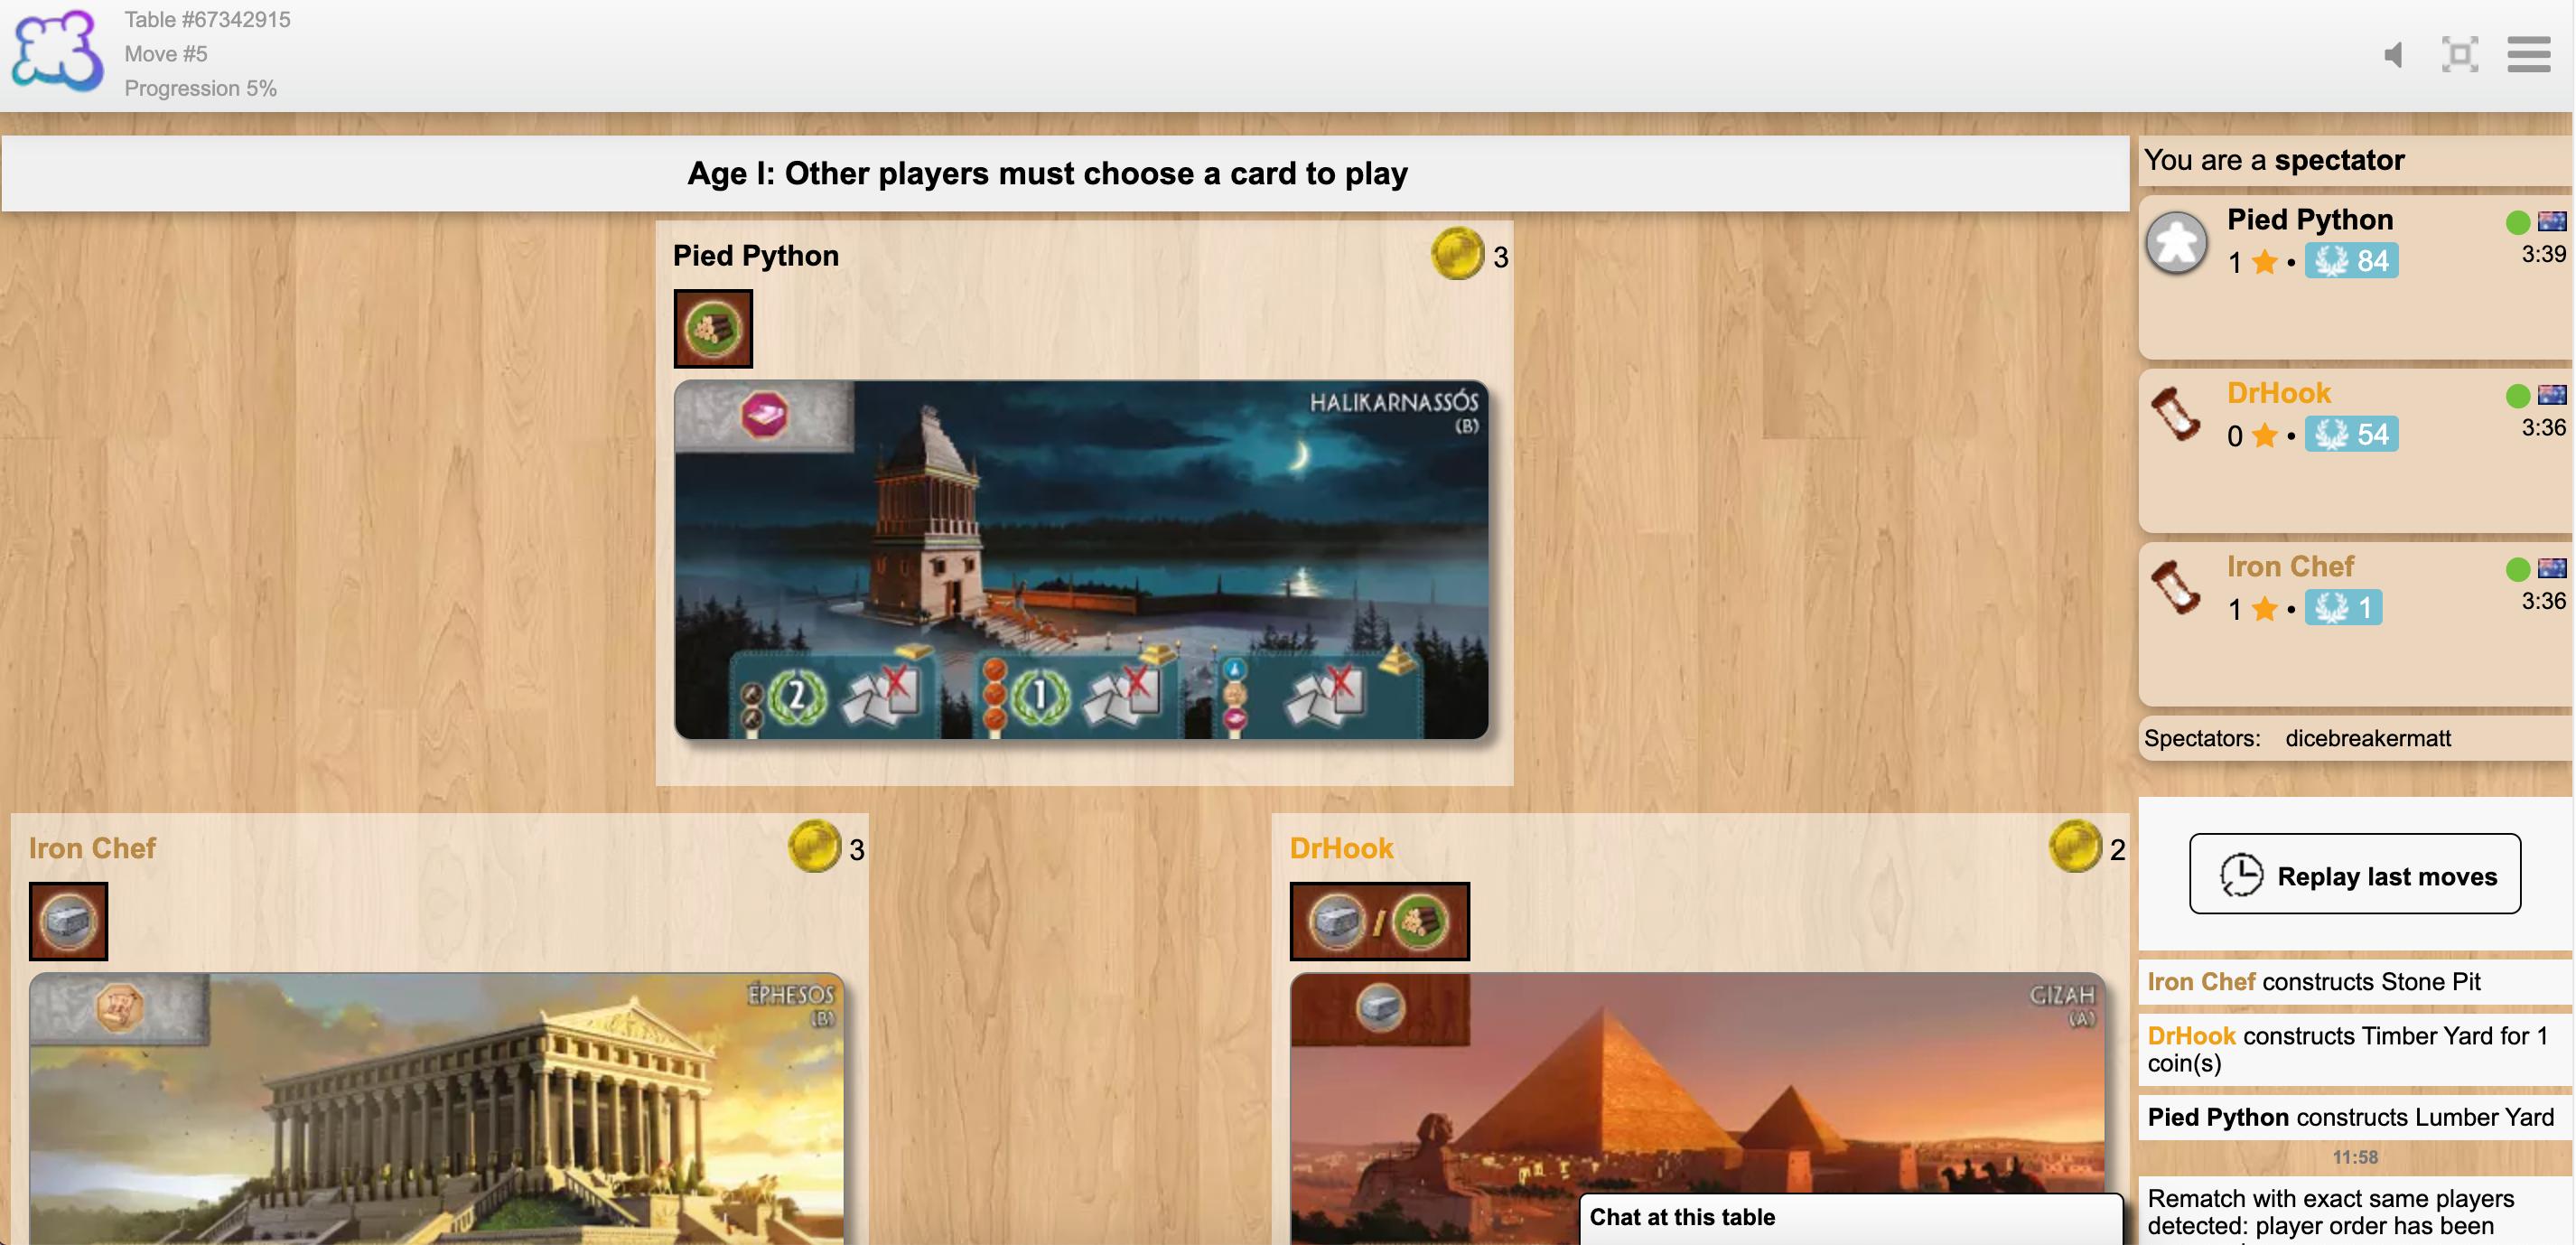 boardgamearena-7-wonders-match.png